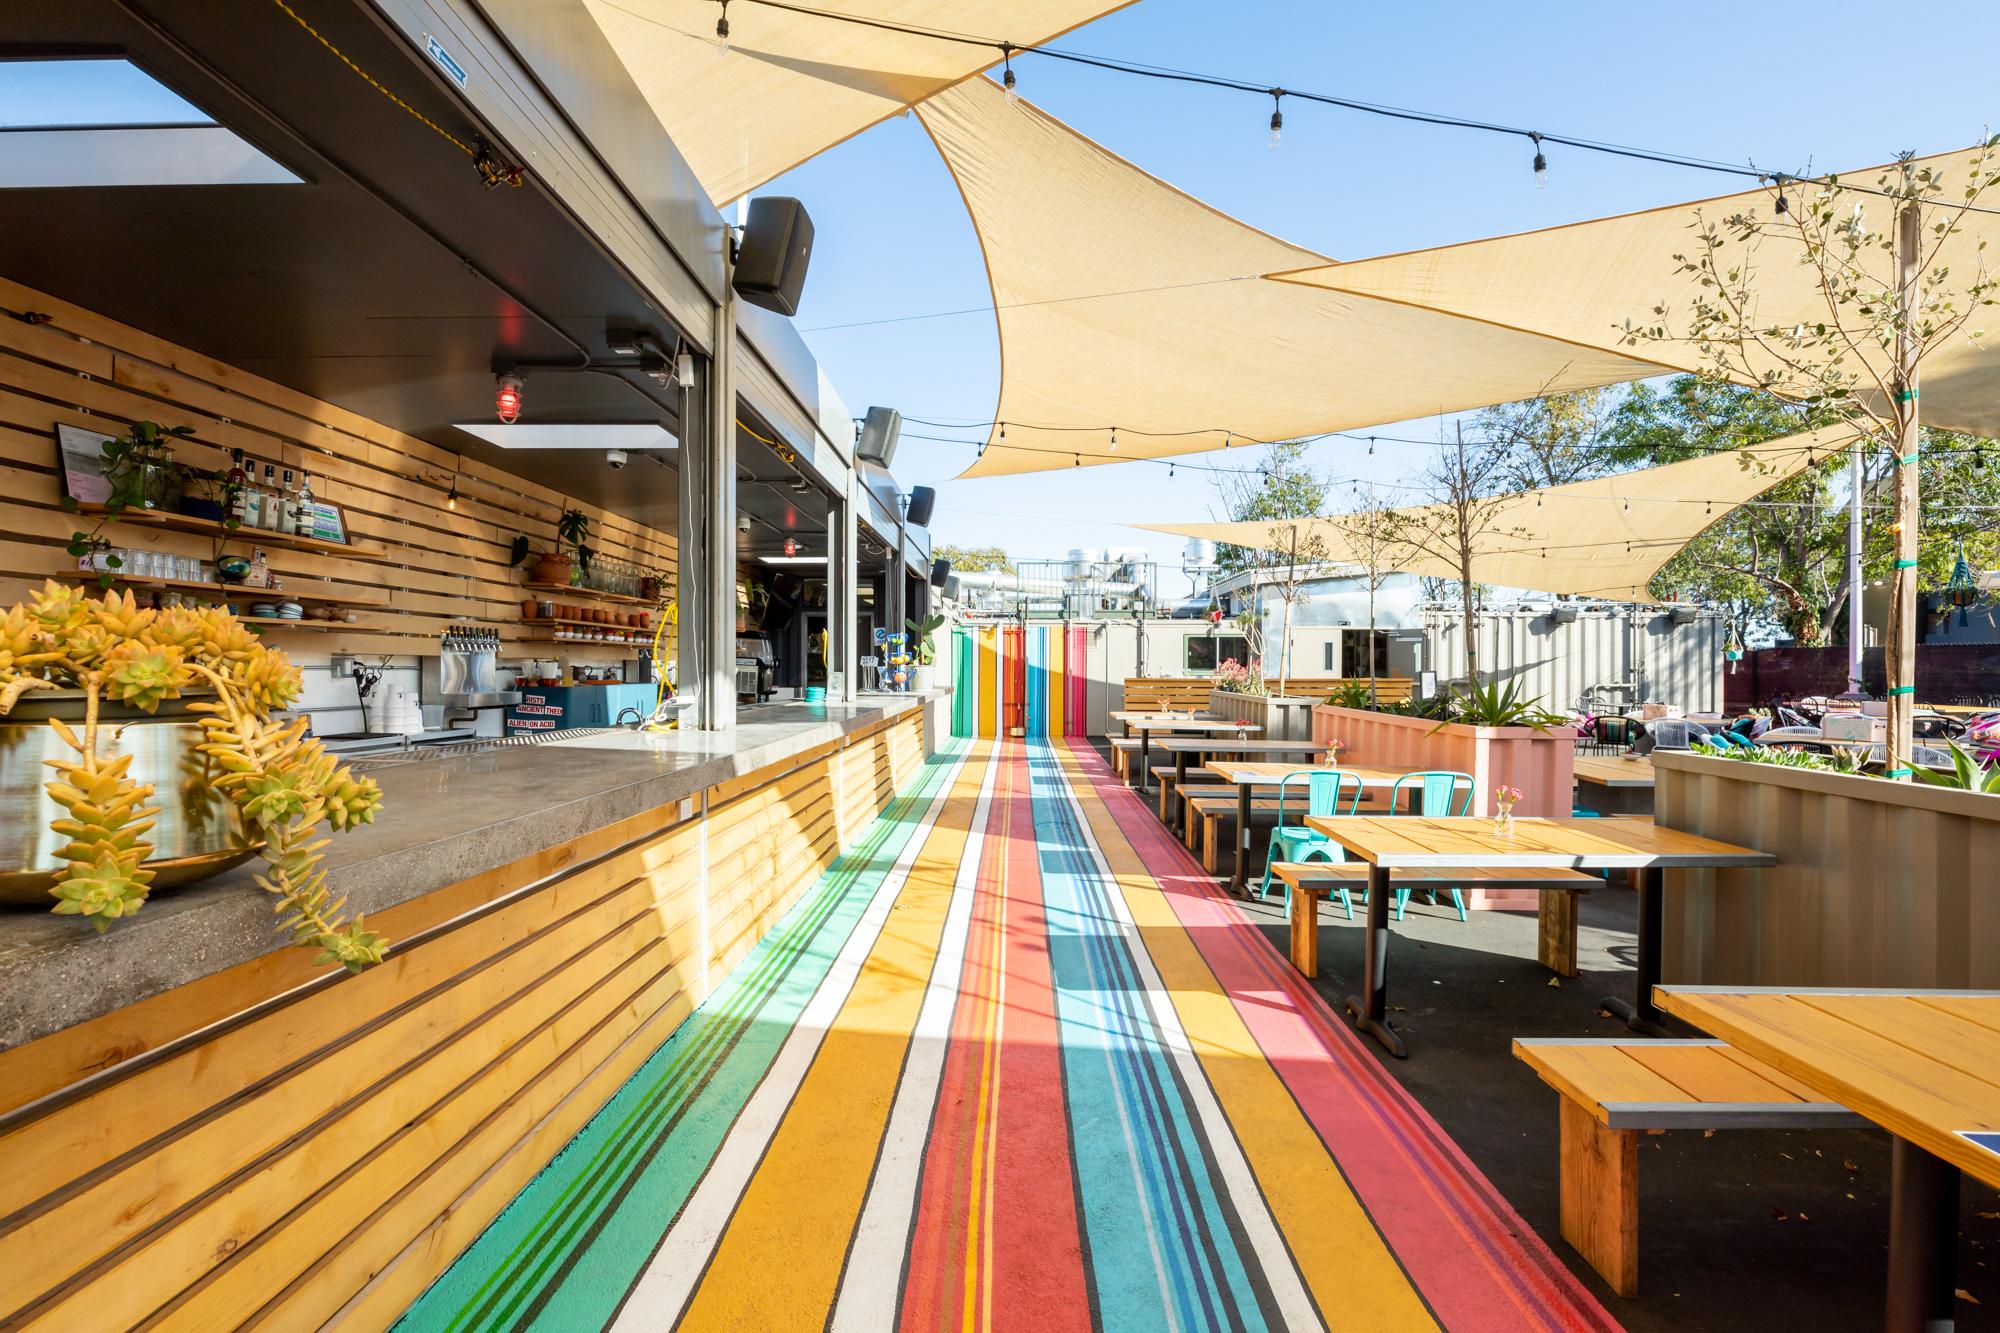 A 'Margarita Garden' and Mexican Restaurant Blossoms in Oakland